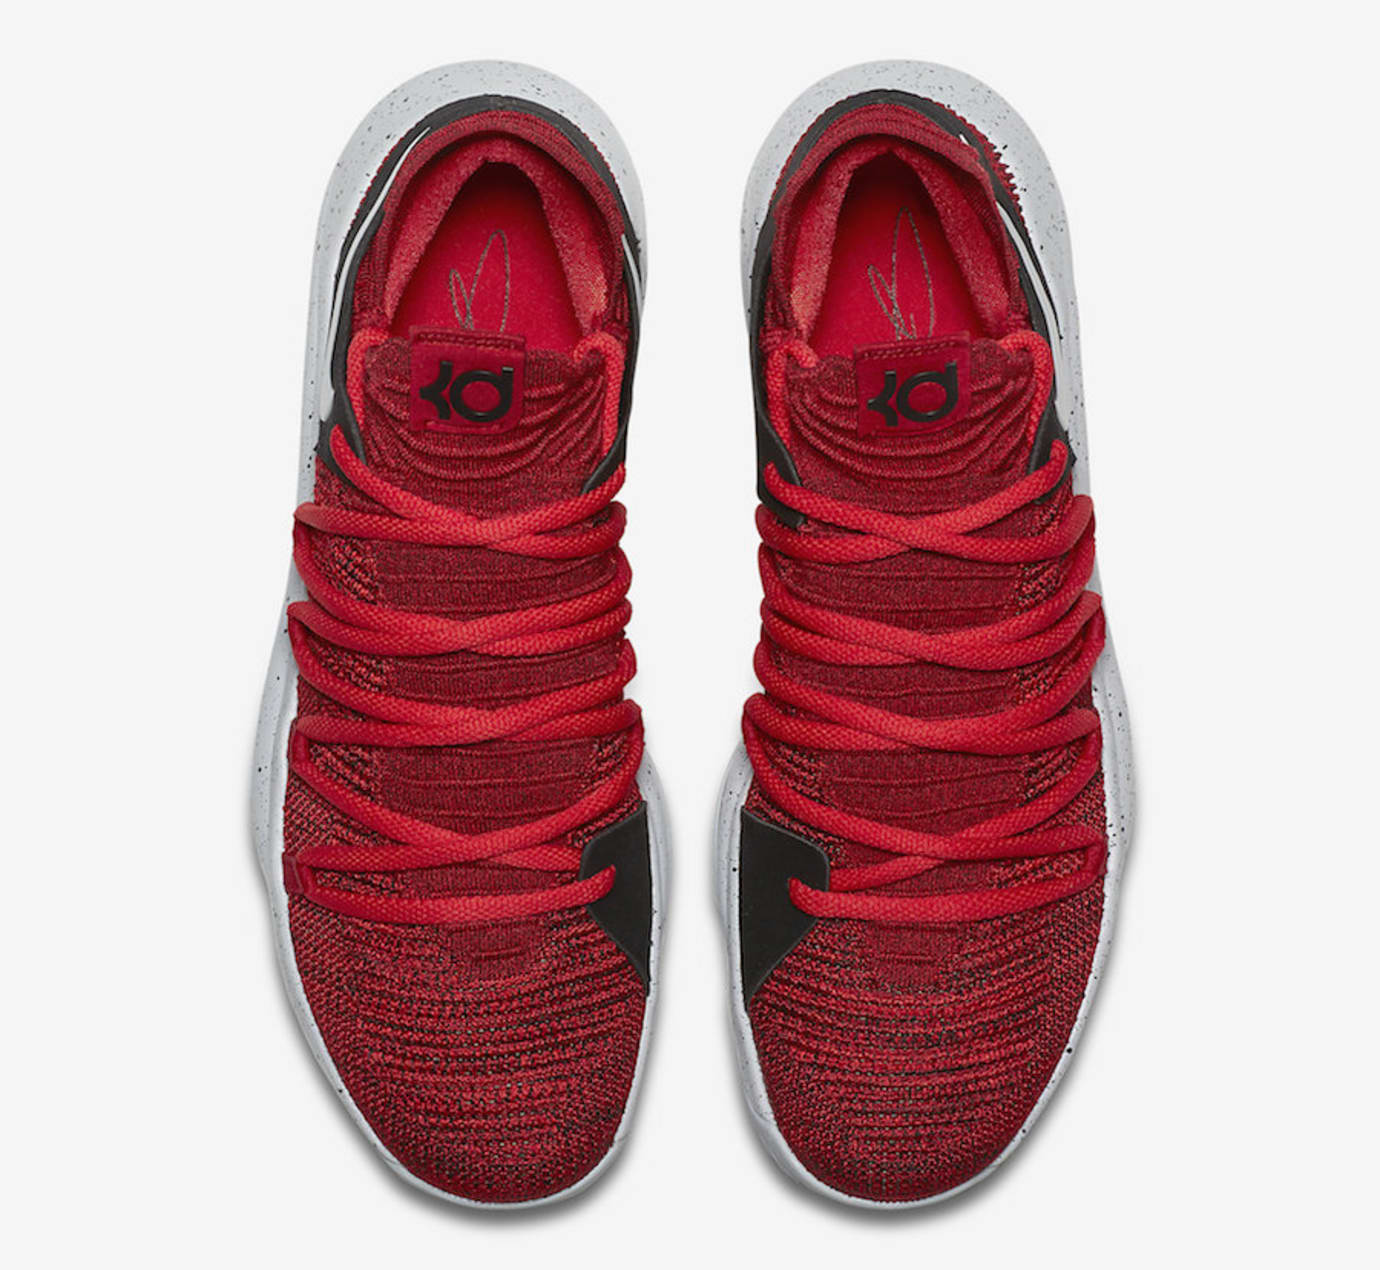 Nike KD 10 University Red Black Release Date Top 897816-600 2e203f726a